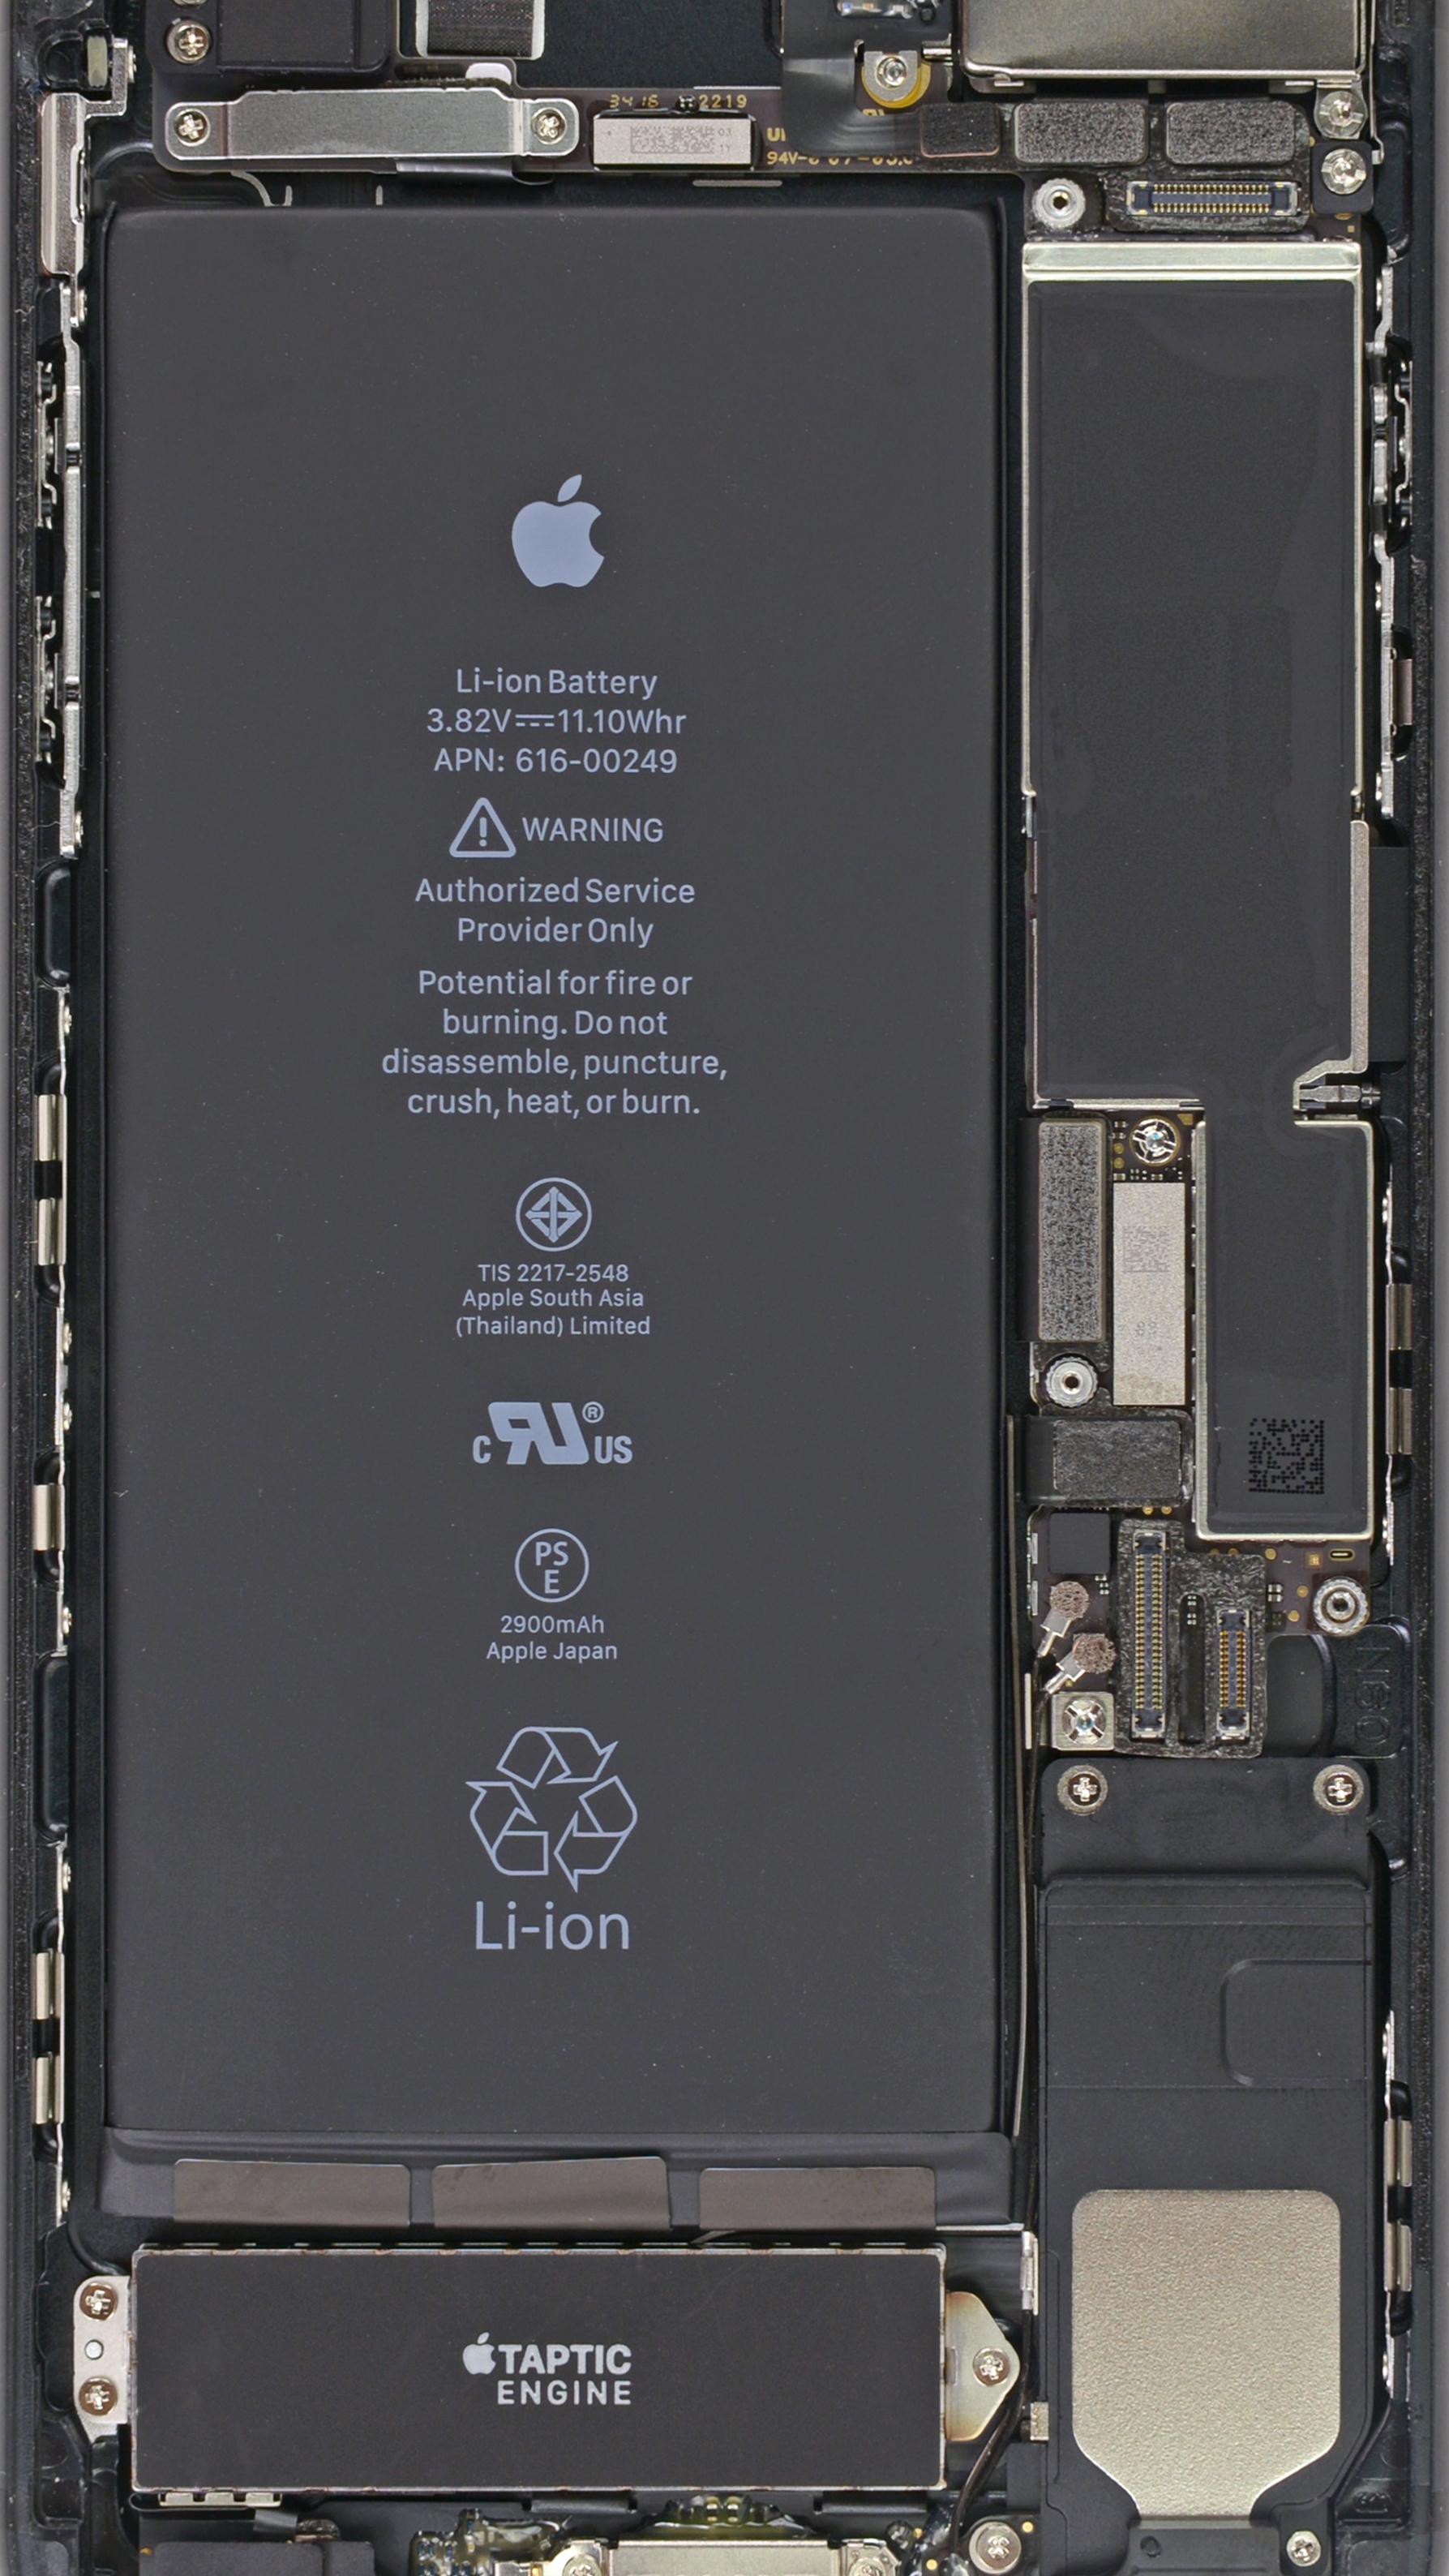 Wallpaper raio X do iPhone 7 Plus